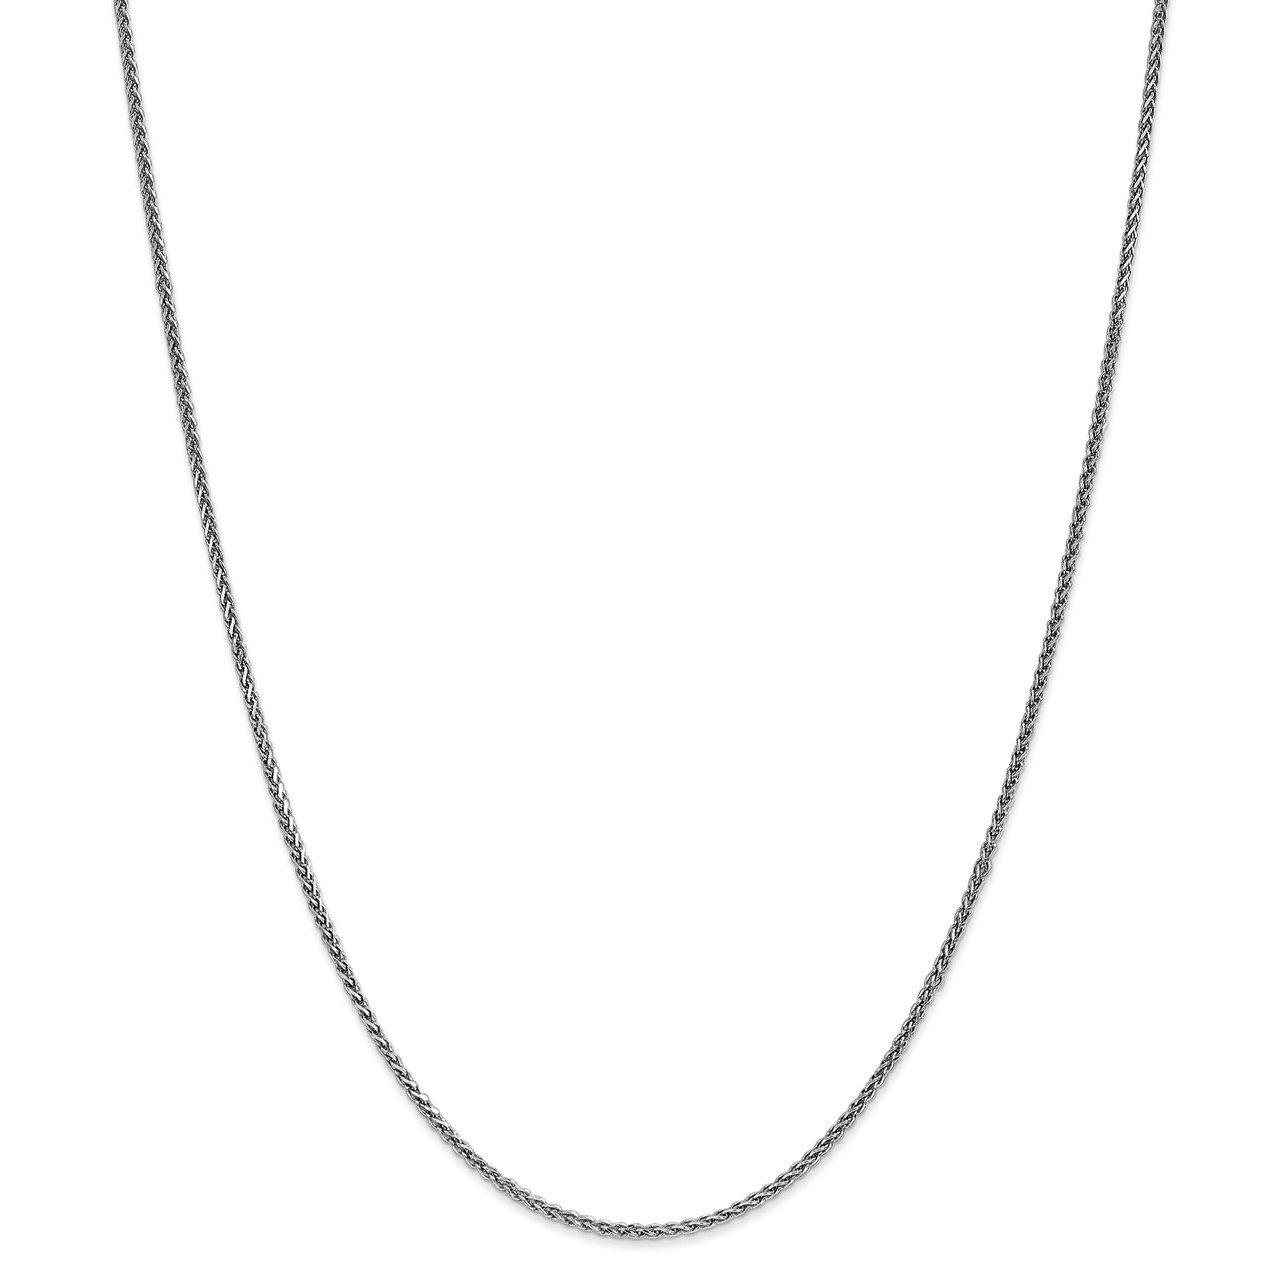 Leslie's 14K White Gold 1.4mm Solid D/C Spiga Chain